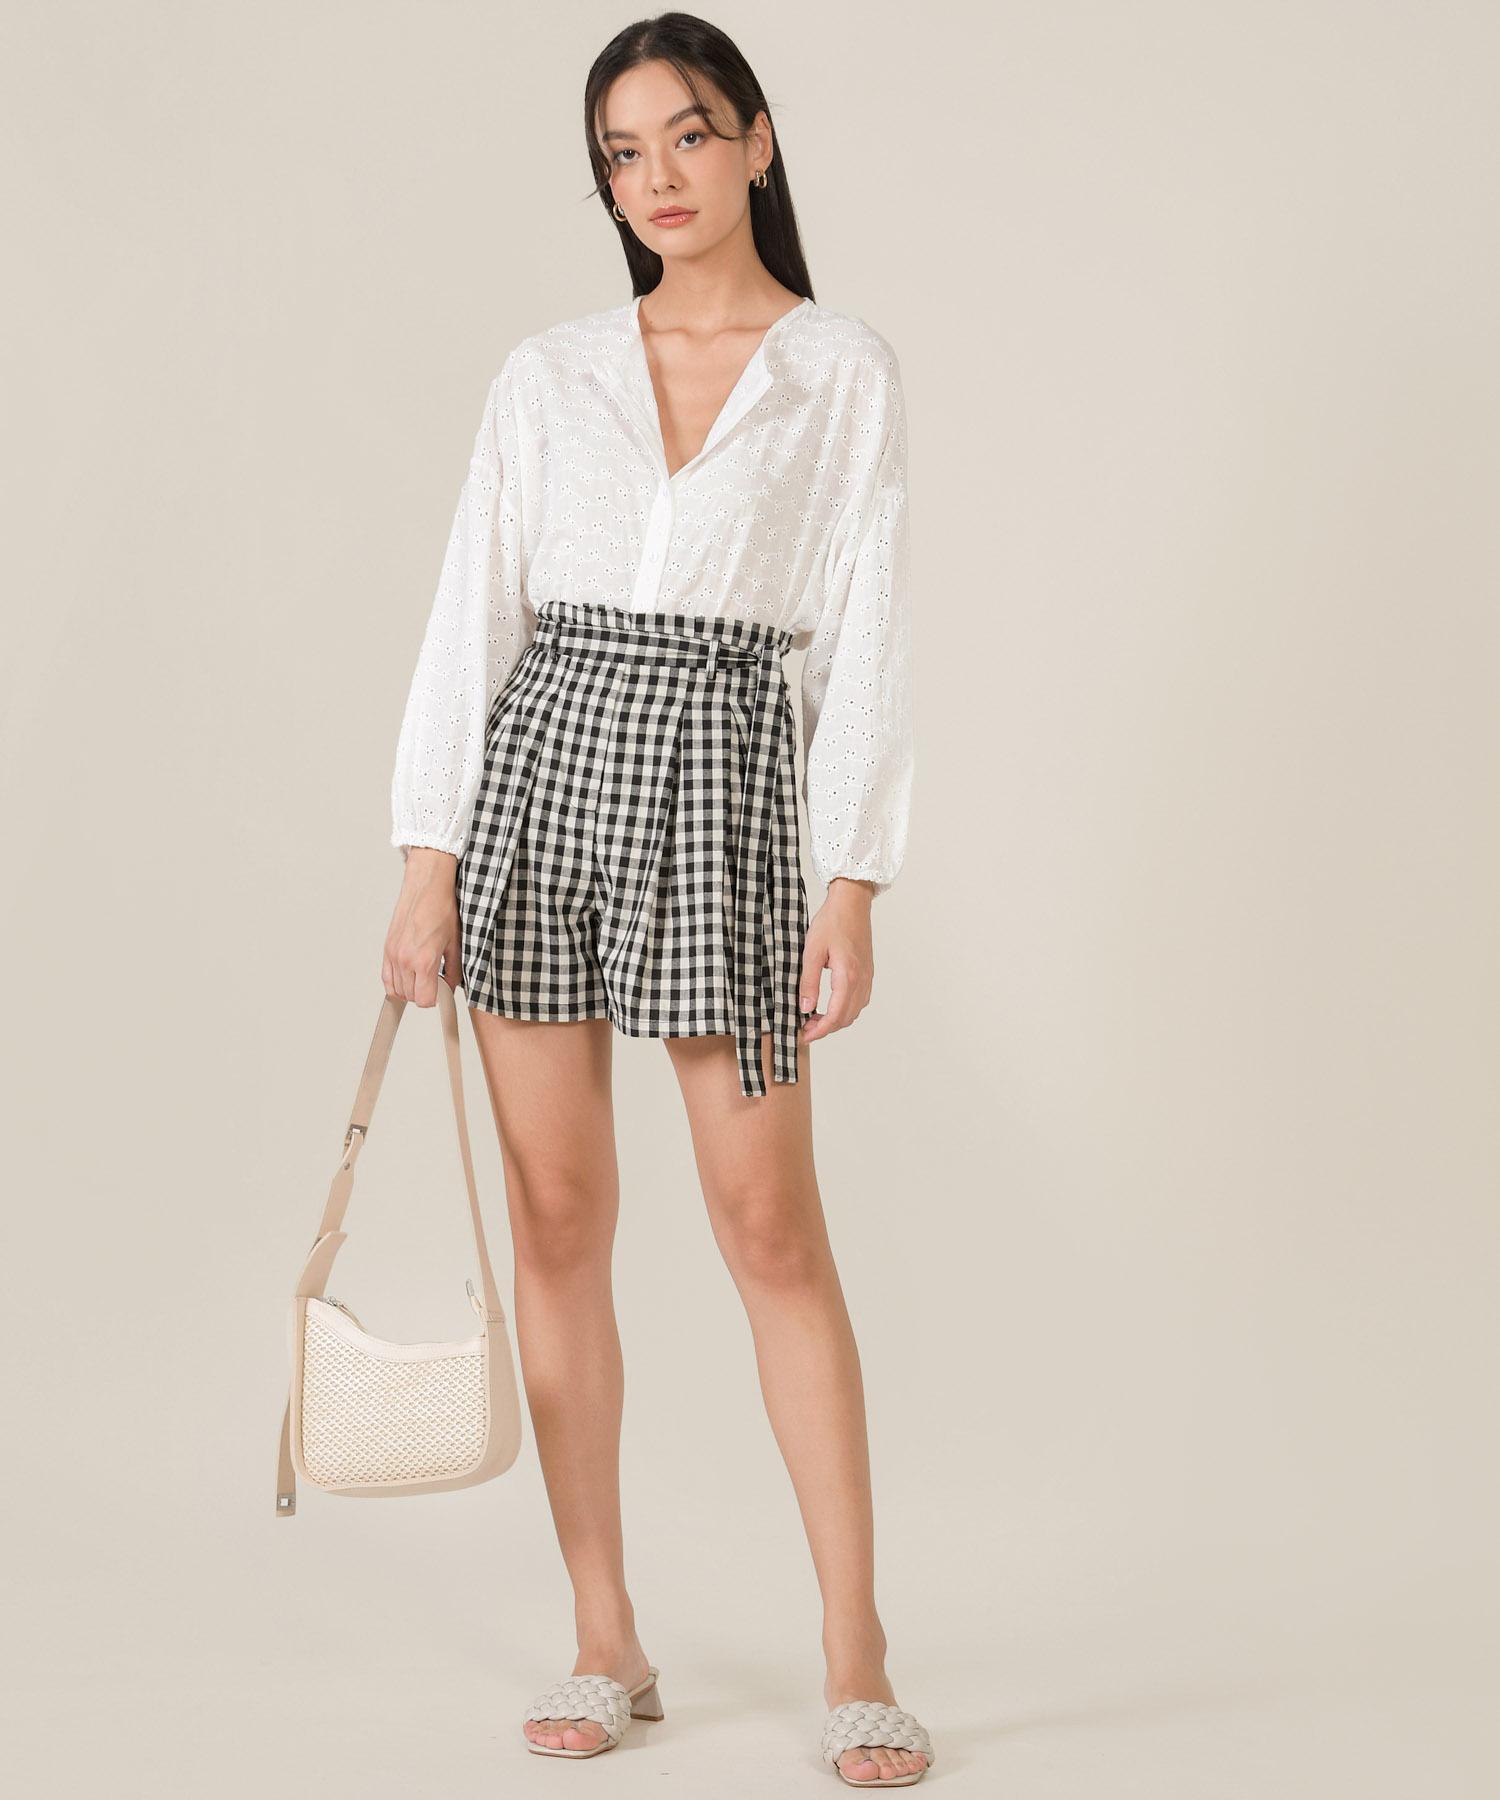 perrotta-gingham-shorts-monochrome-1